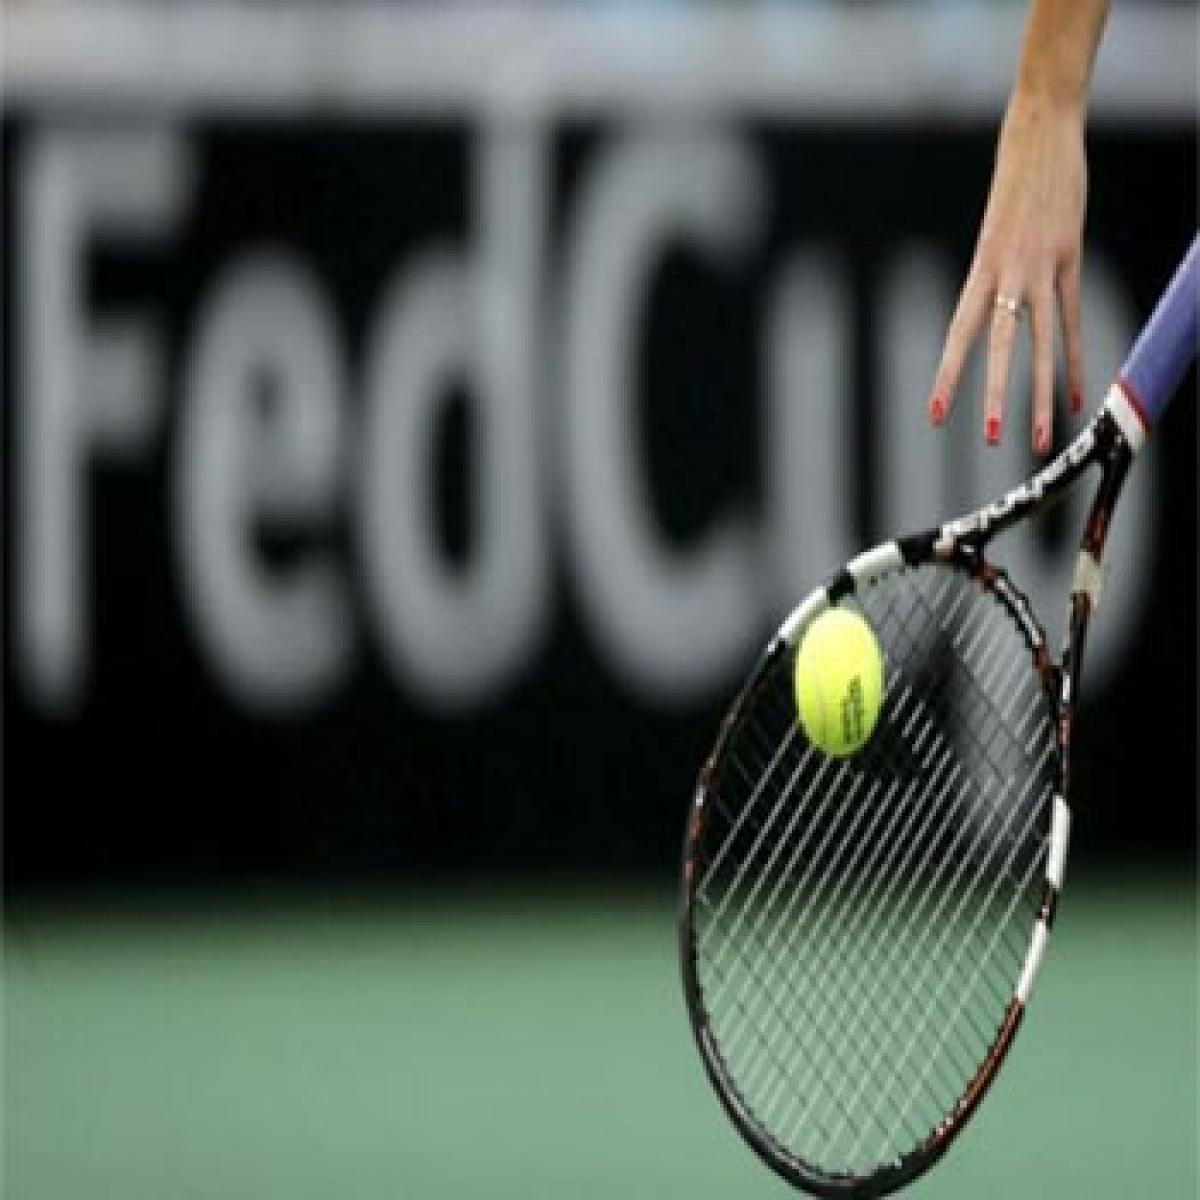 Fixing raises ugly head in tennis